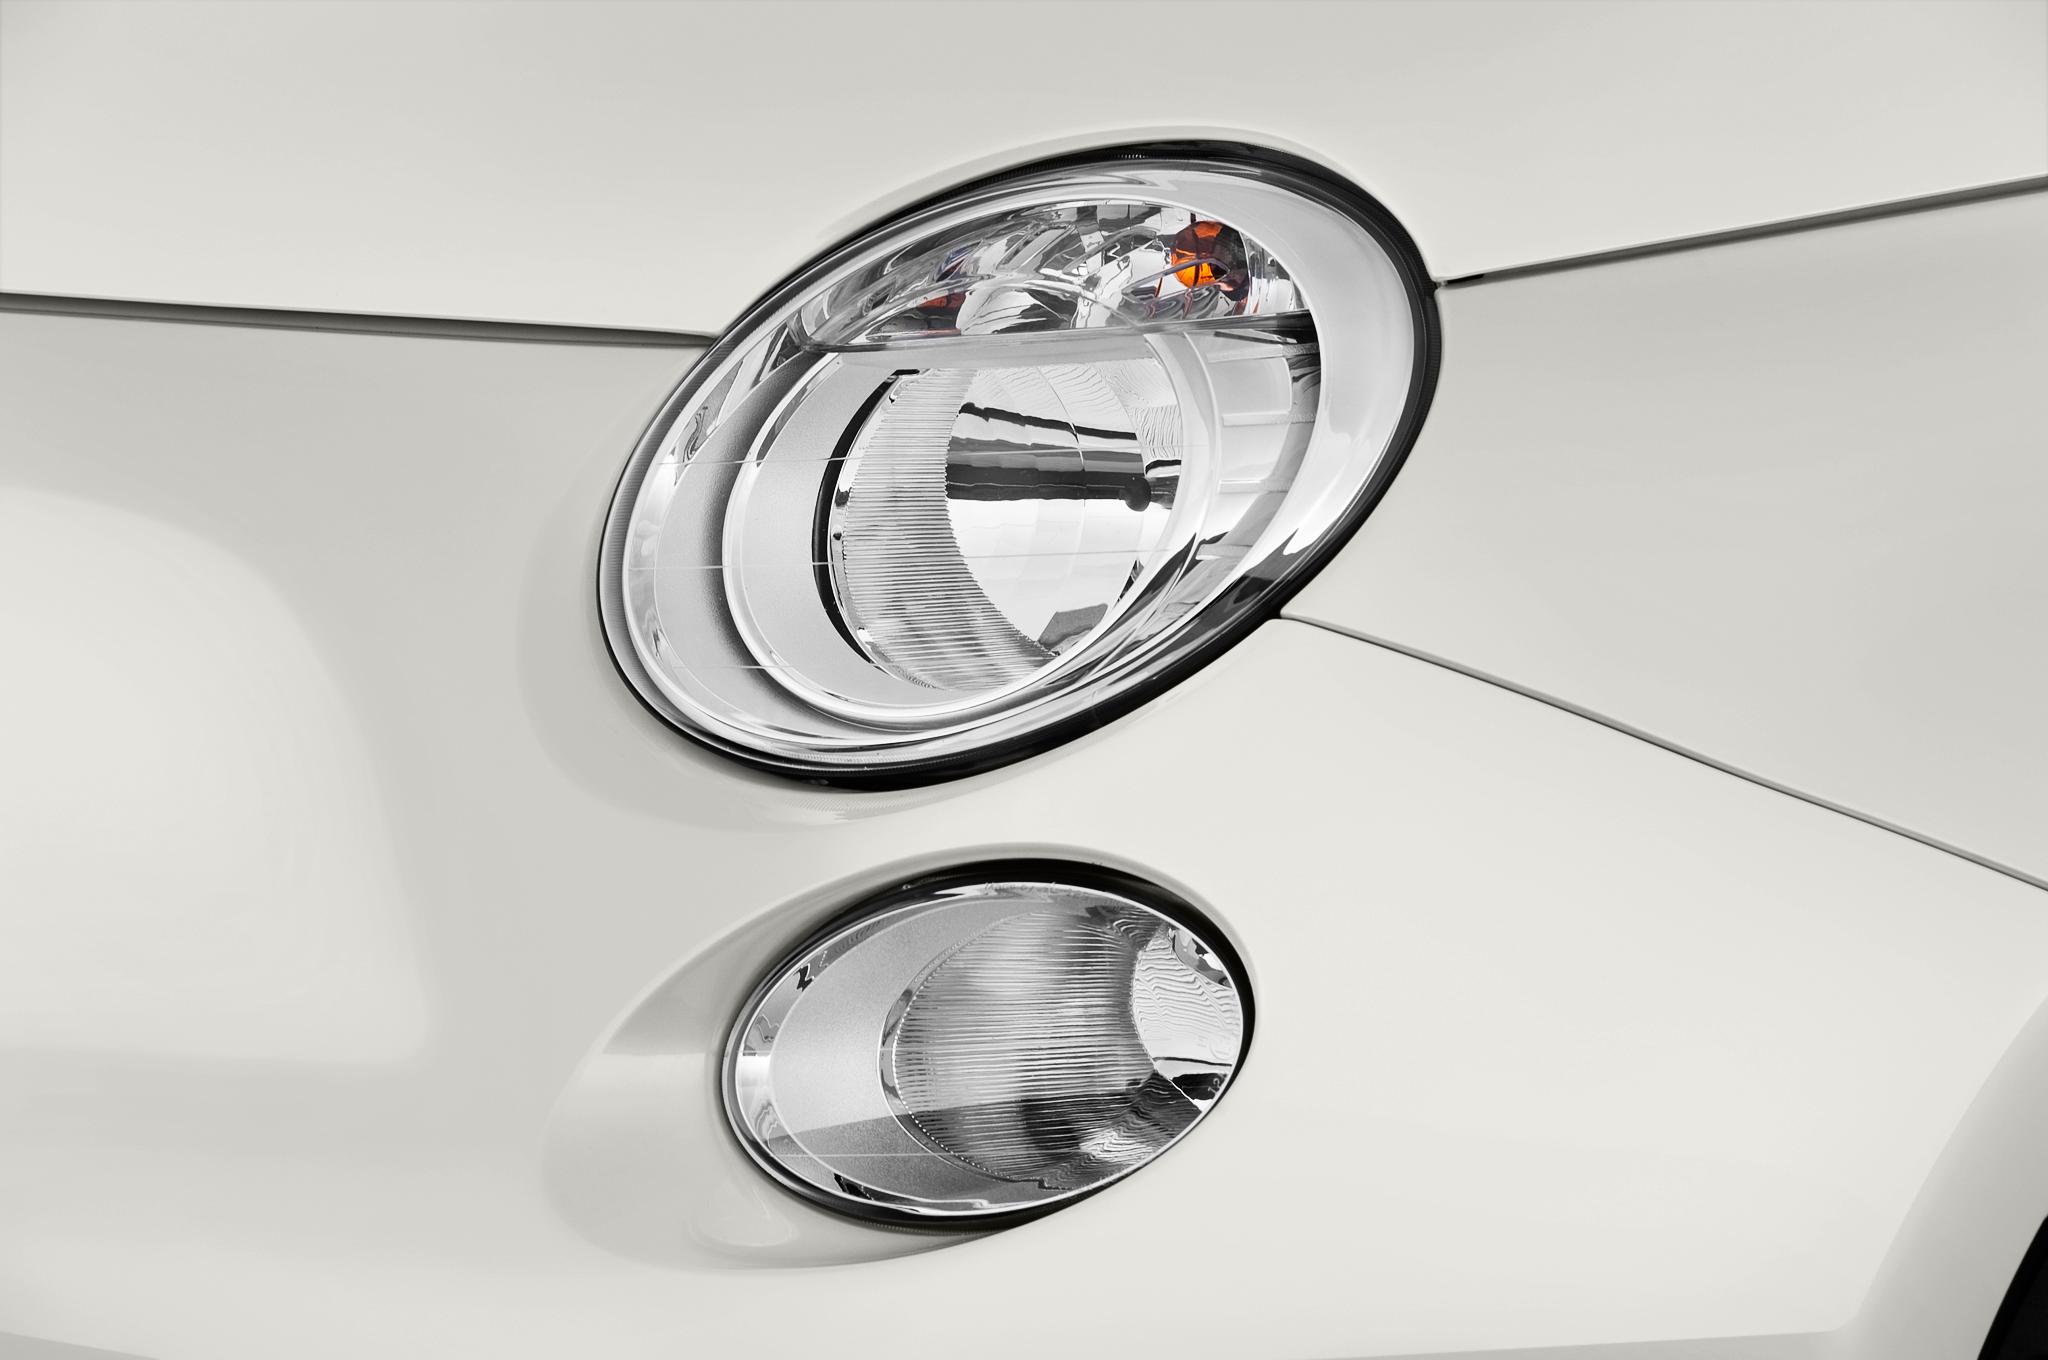 2015 Fiat 500 Abarth Automatic Around The Block Interior 58 140